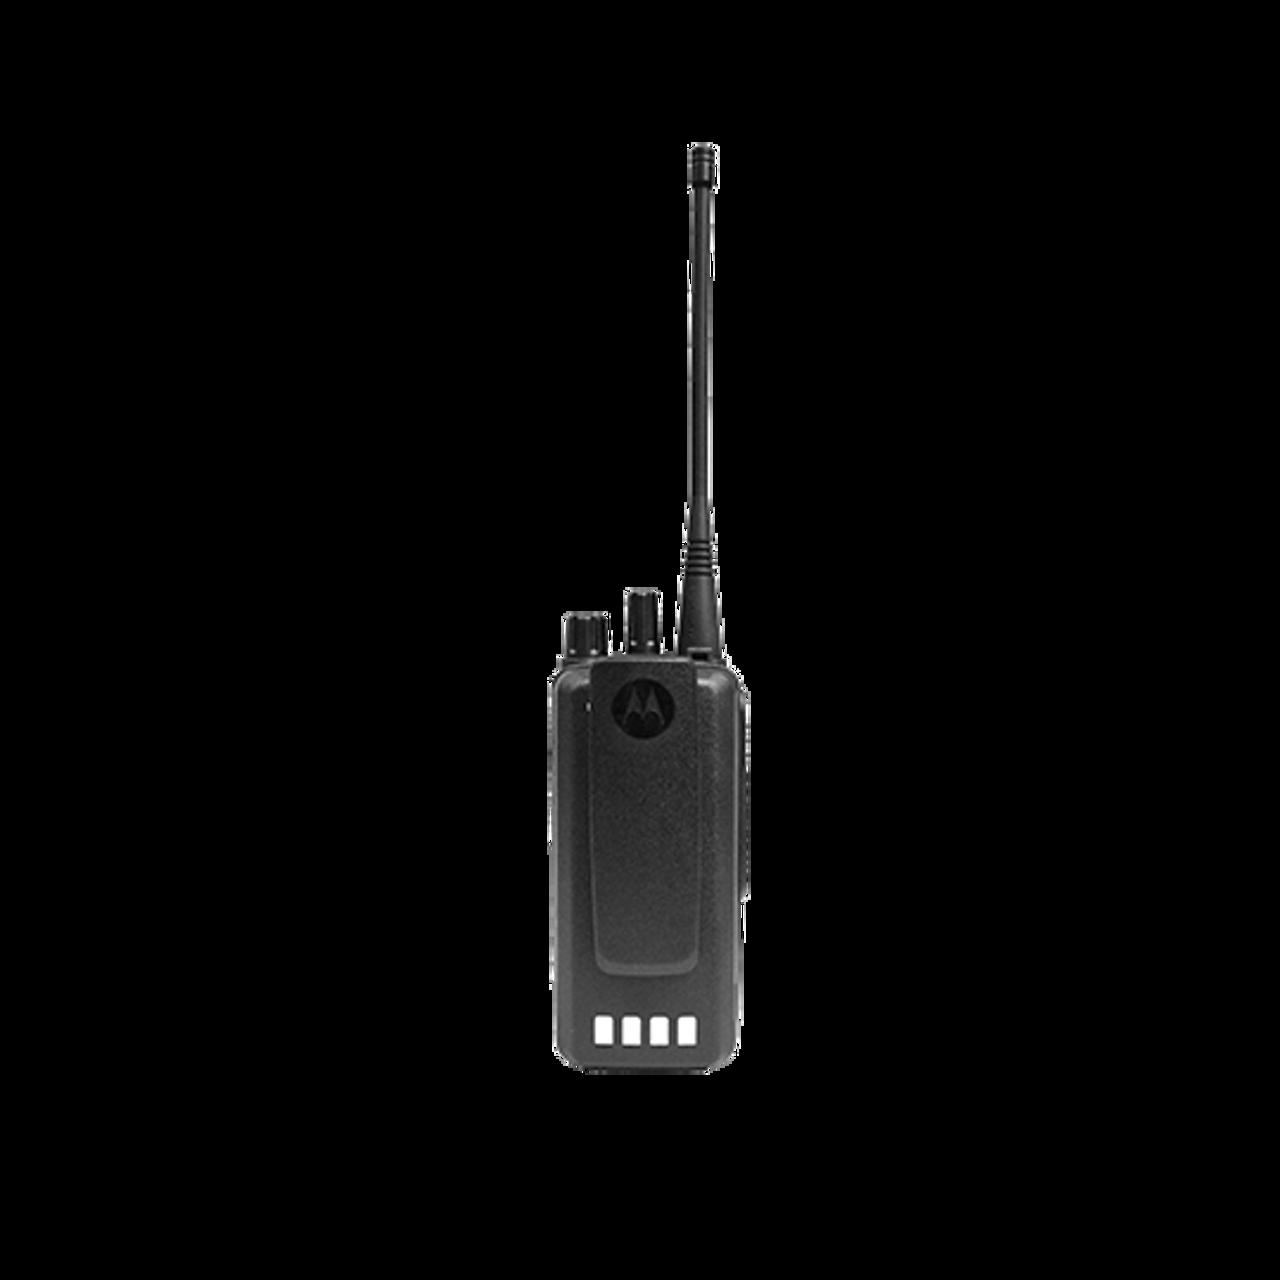 Motorola CP100d 160 Channel TDMA Digital Two Way Radio